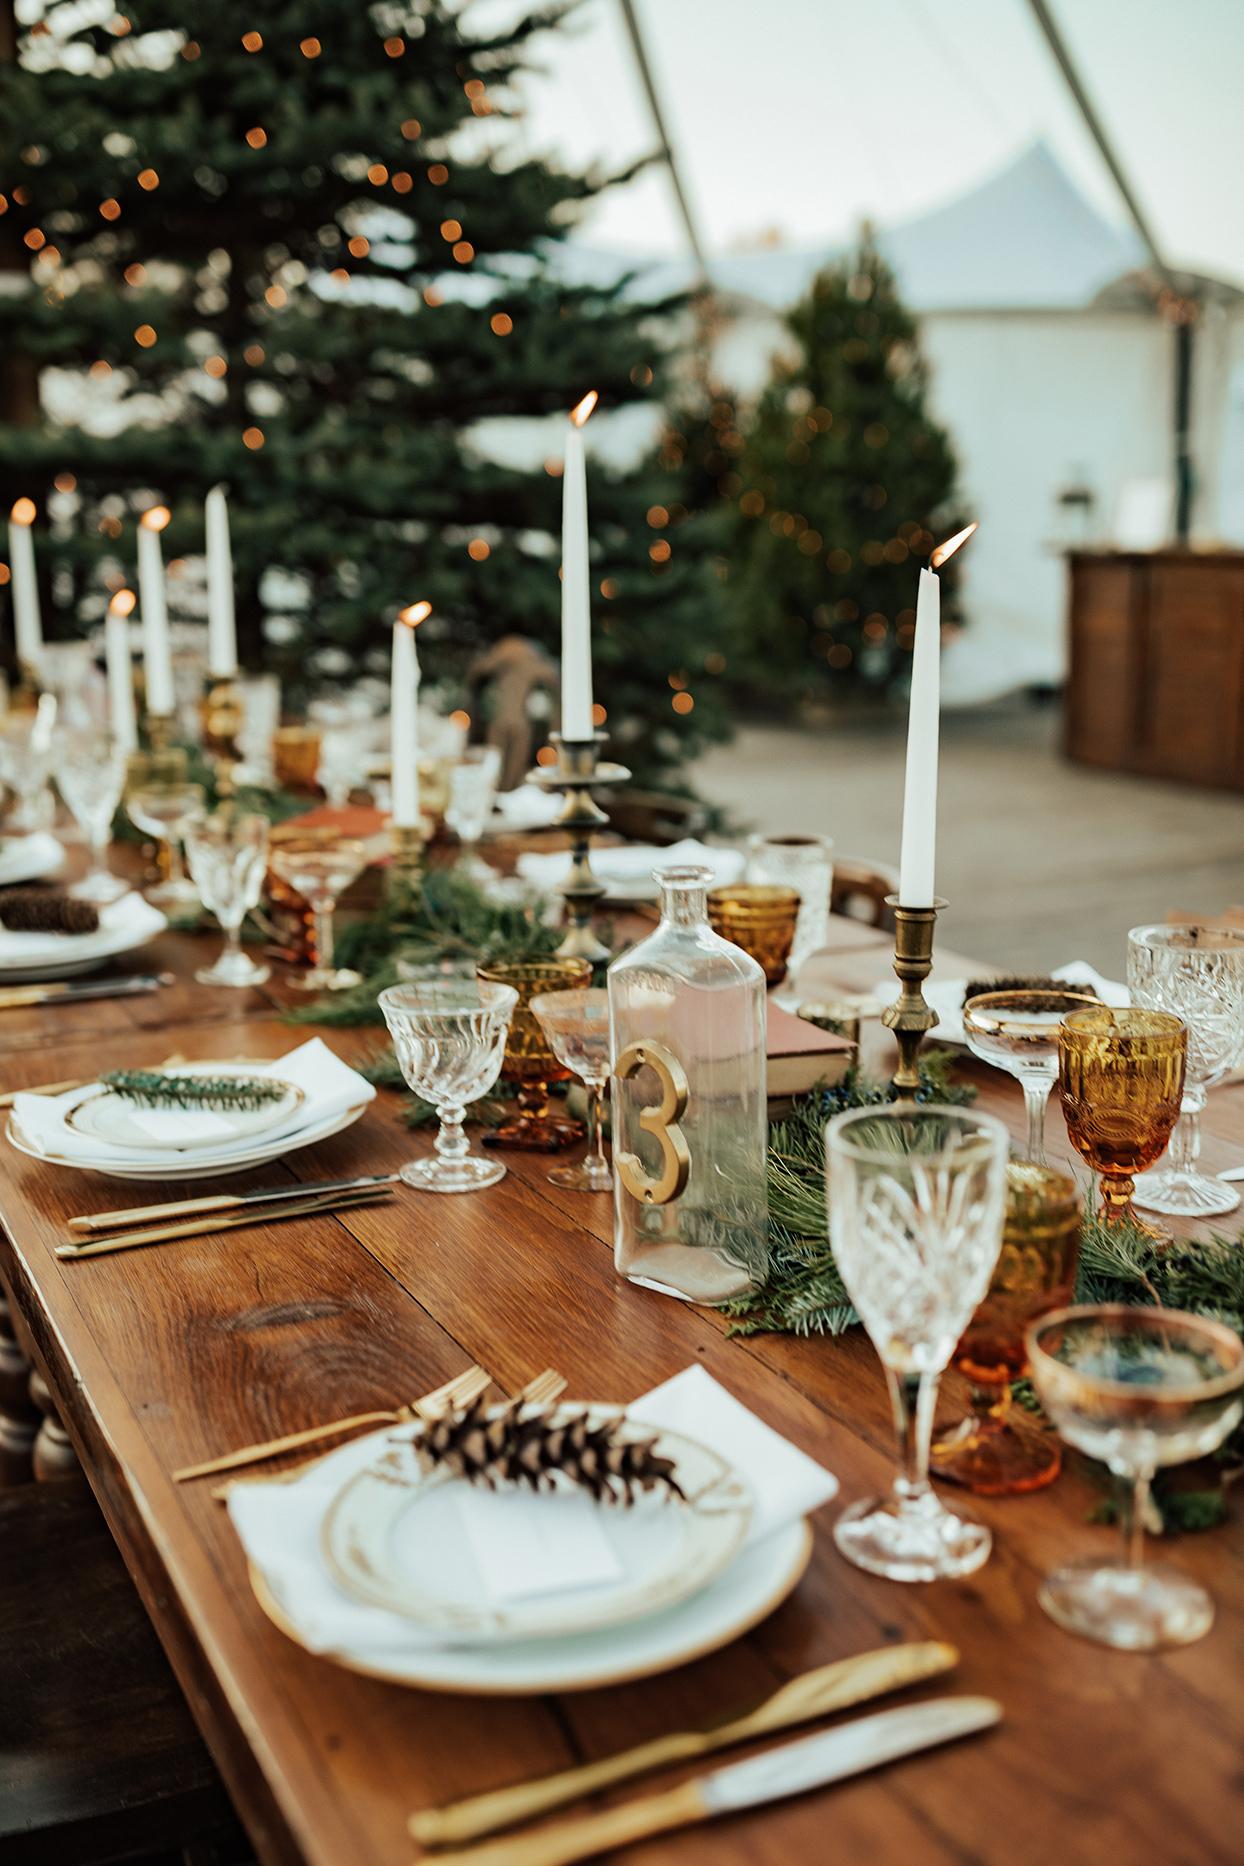 noelle danny wedding wooden rustic table setting